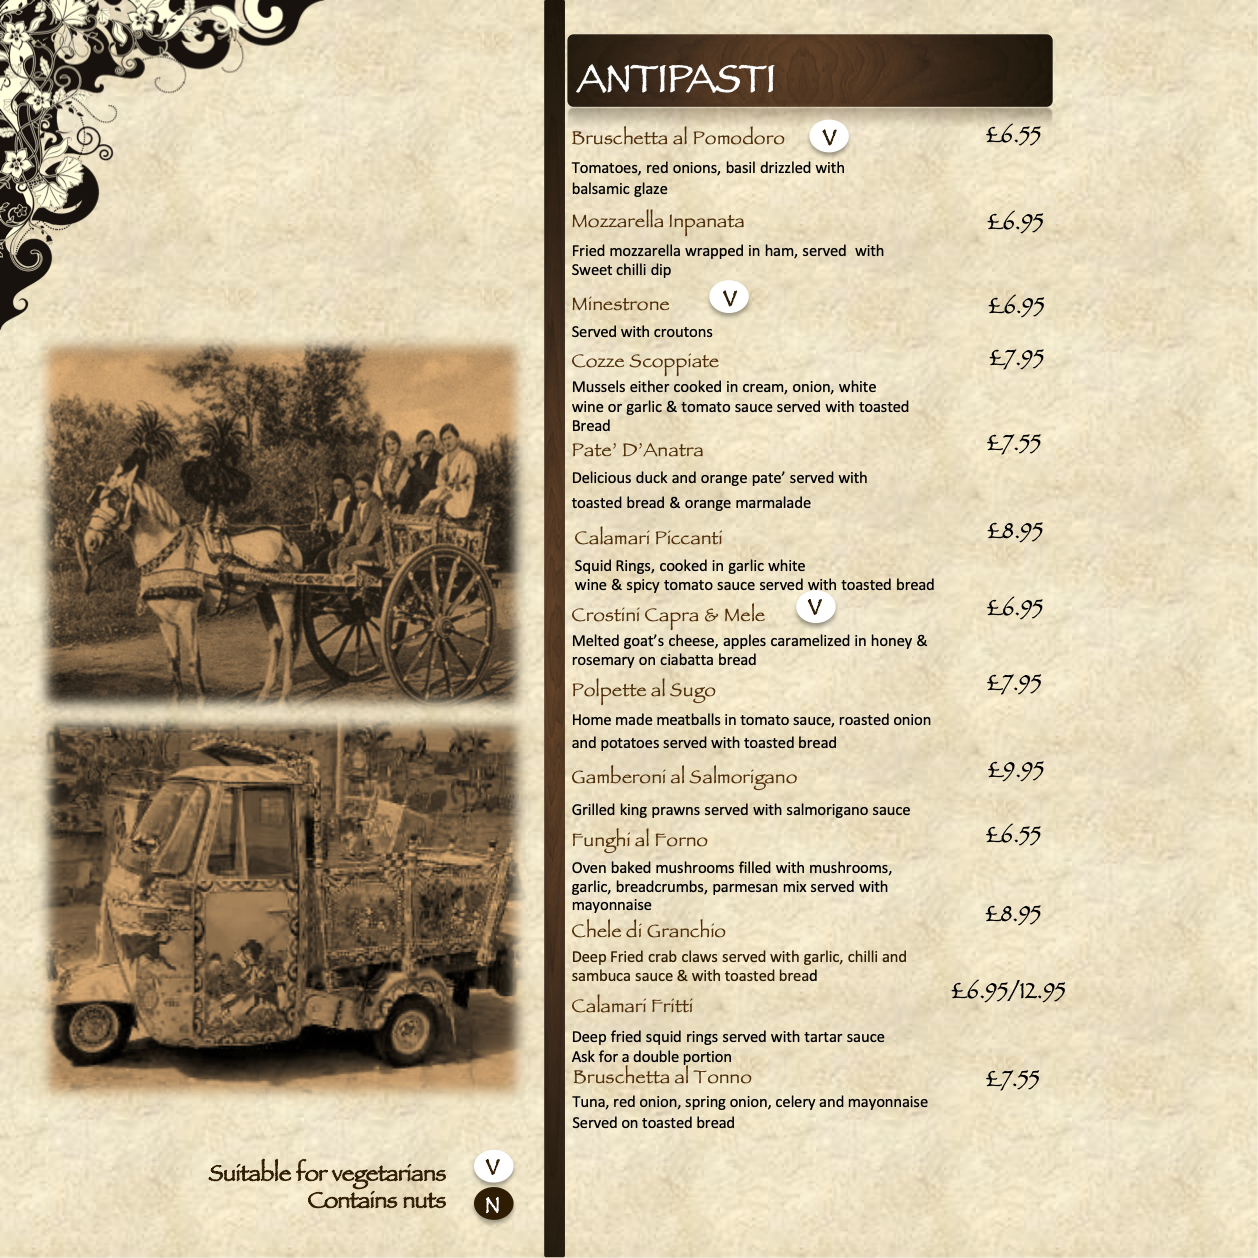 menu 2020 sicily4